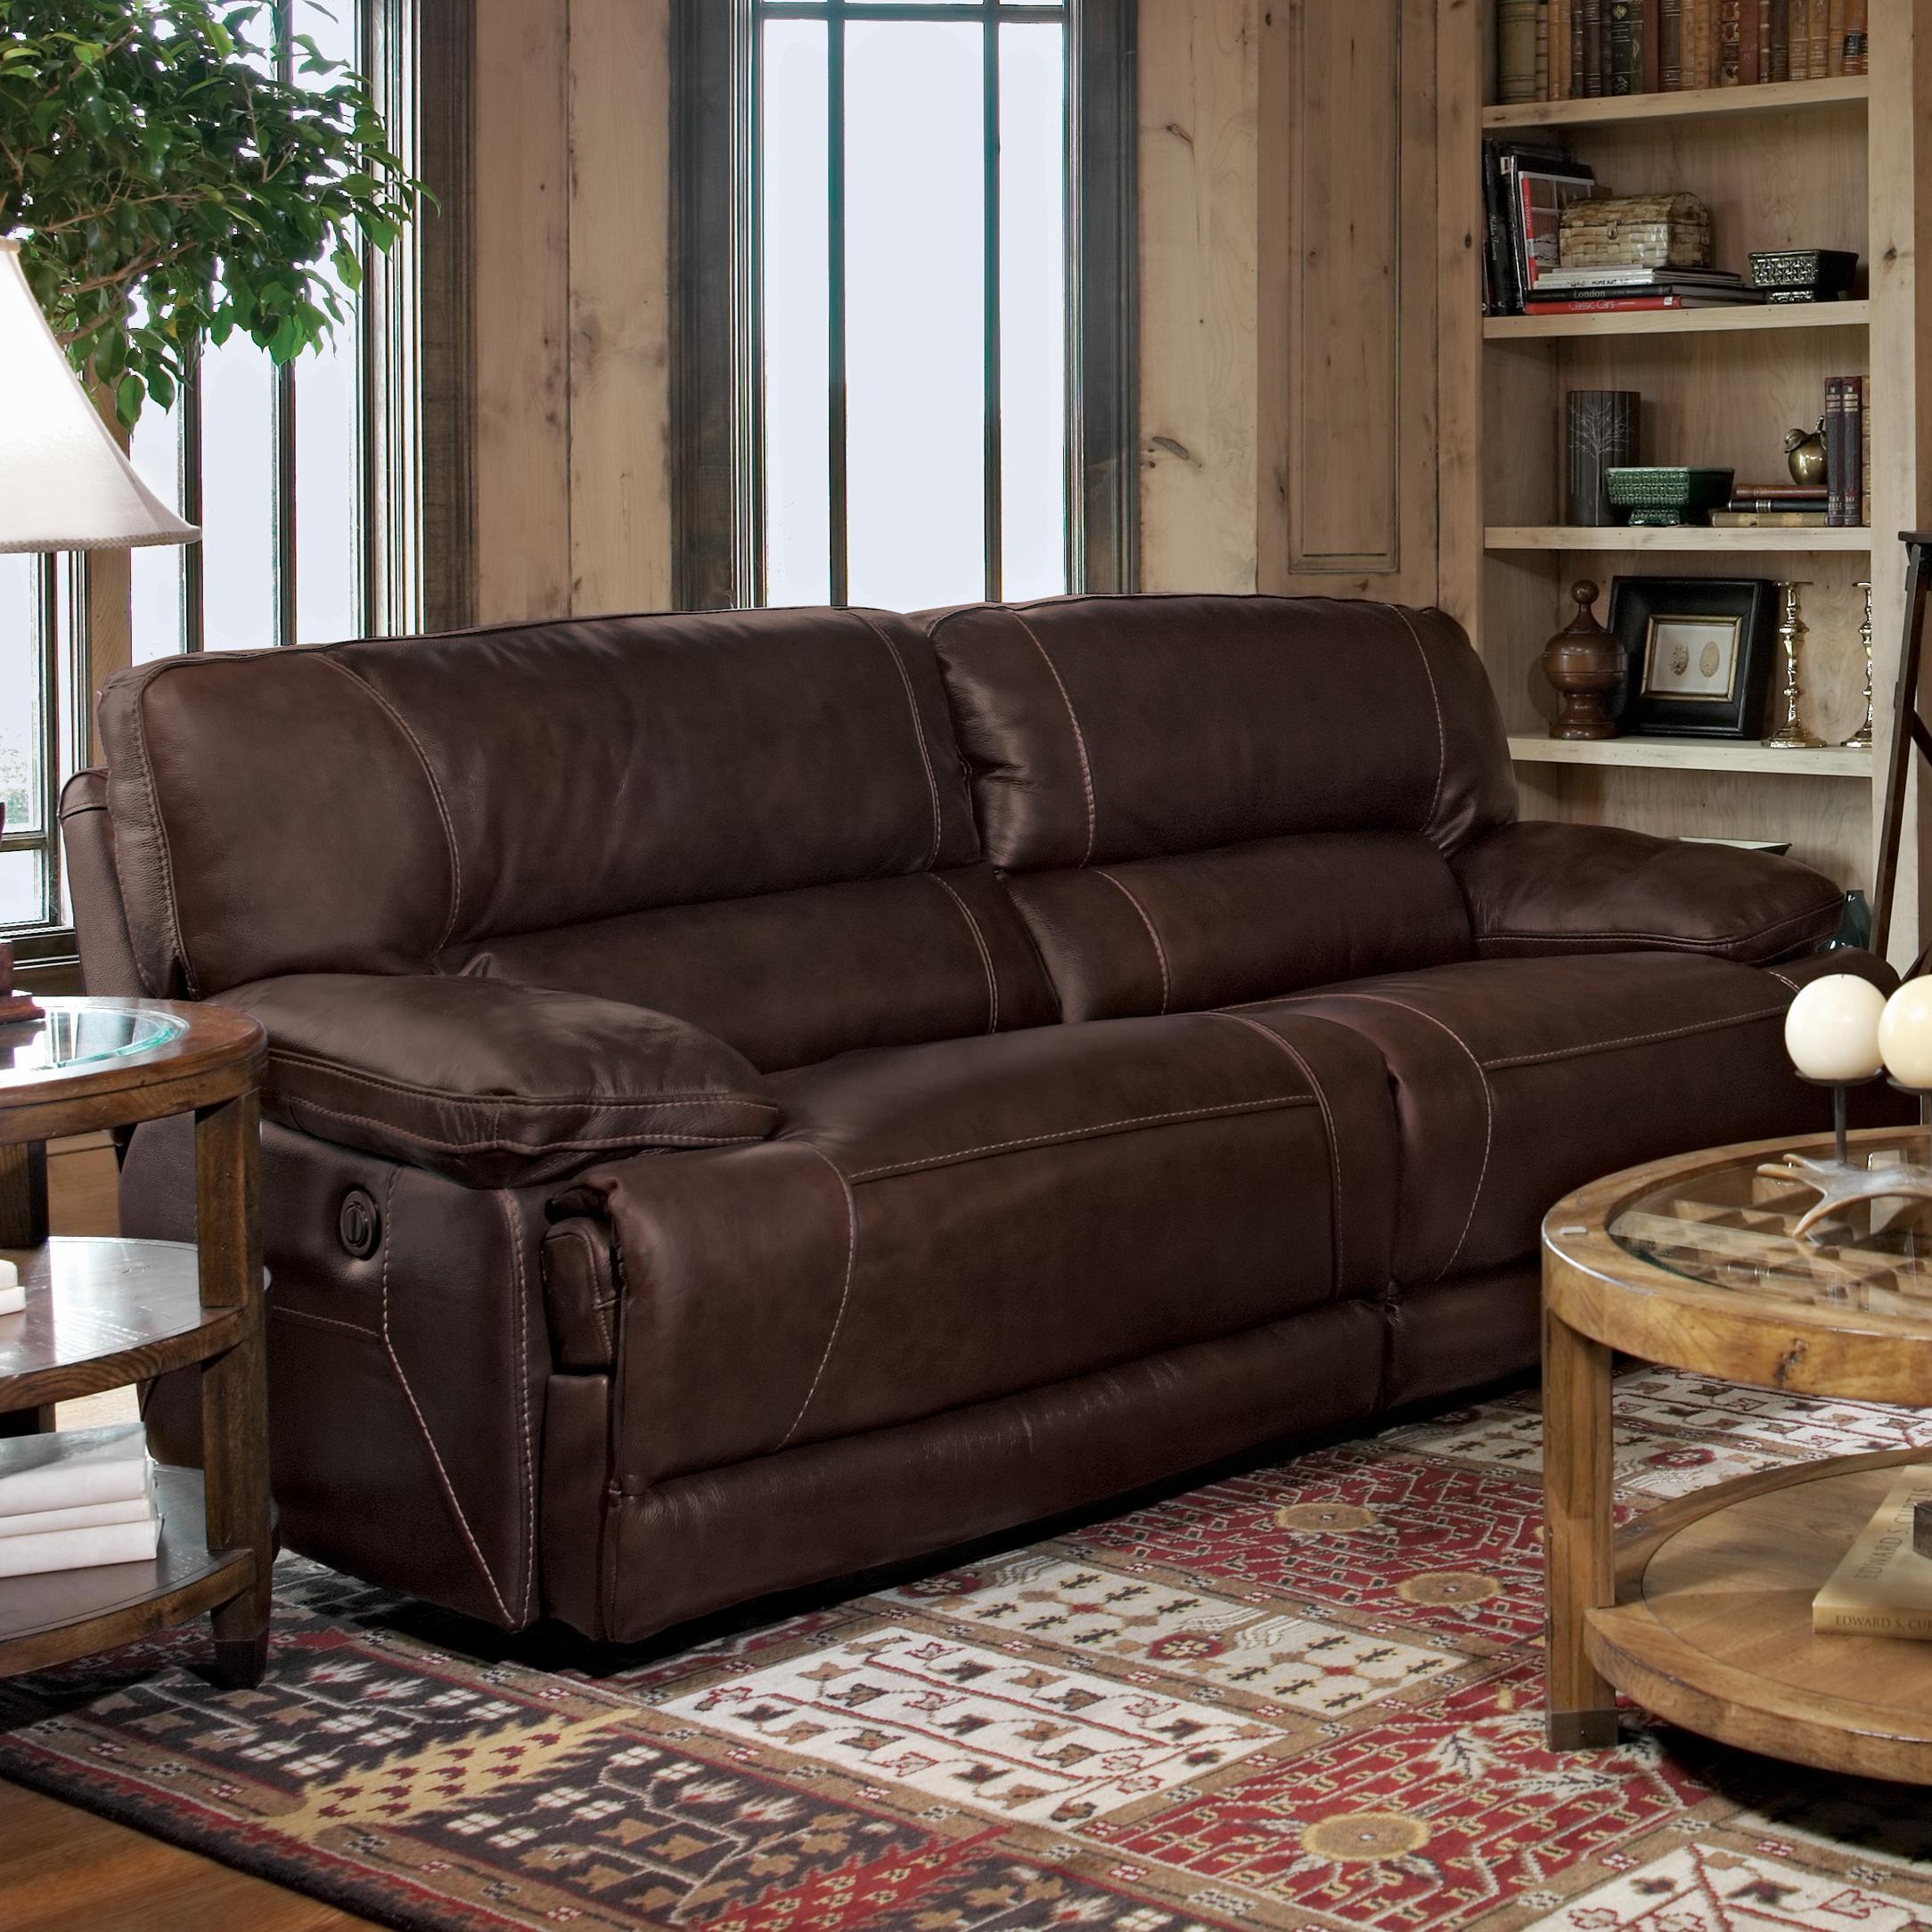 flexsteel latitudes fleet street 1237 62p double power reclining rh dunkandbright com flexsteel reclining sofa price flexsteel reclining sofa for sale